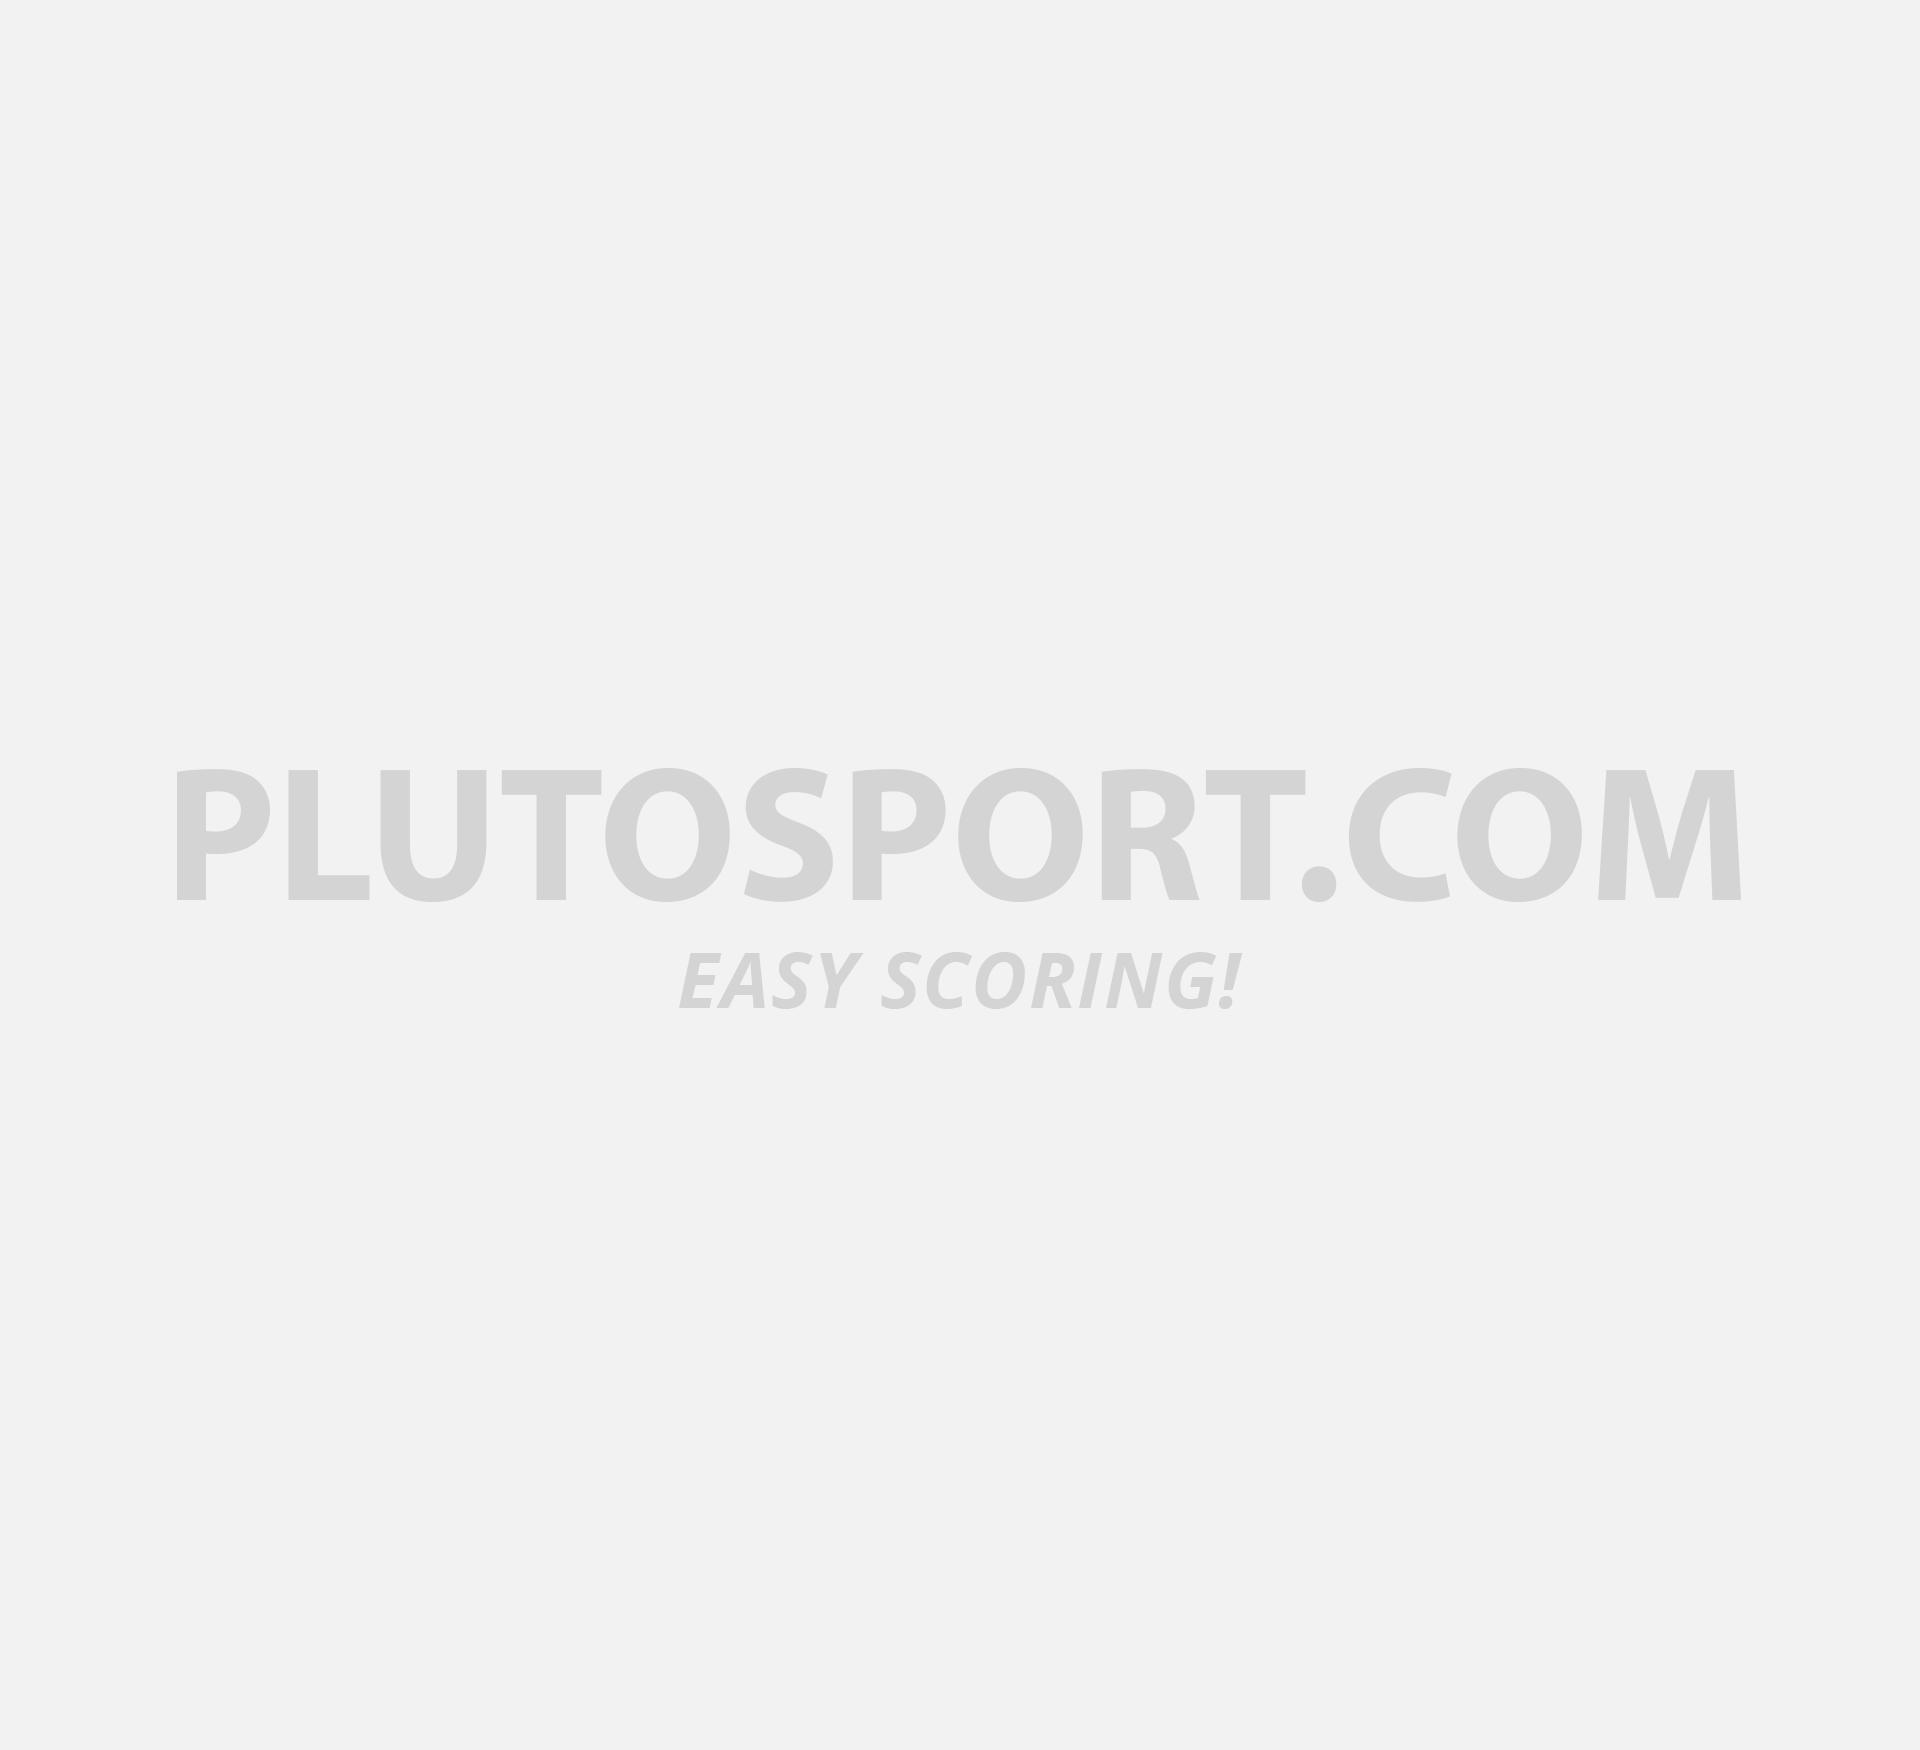 Adidas Workout Motion II Fitnessshoe Womenu0026#39;s - Shoes - Fitness - Women | Plutosport